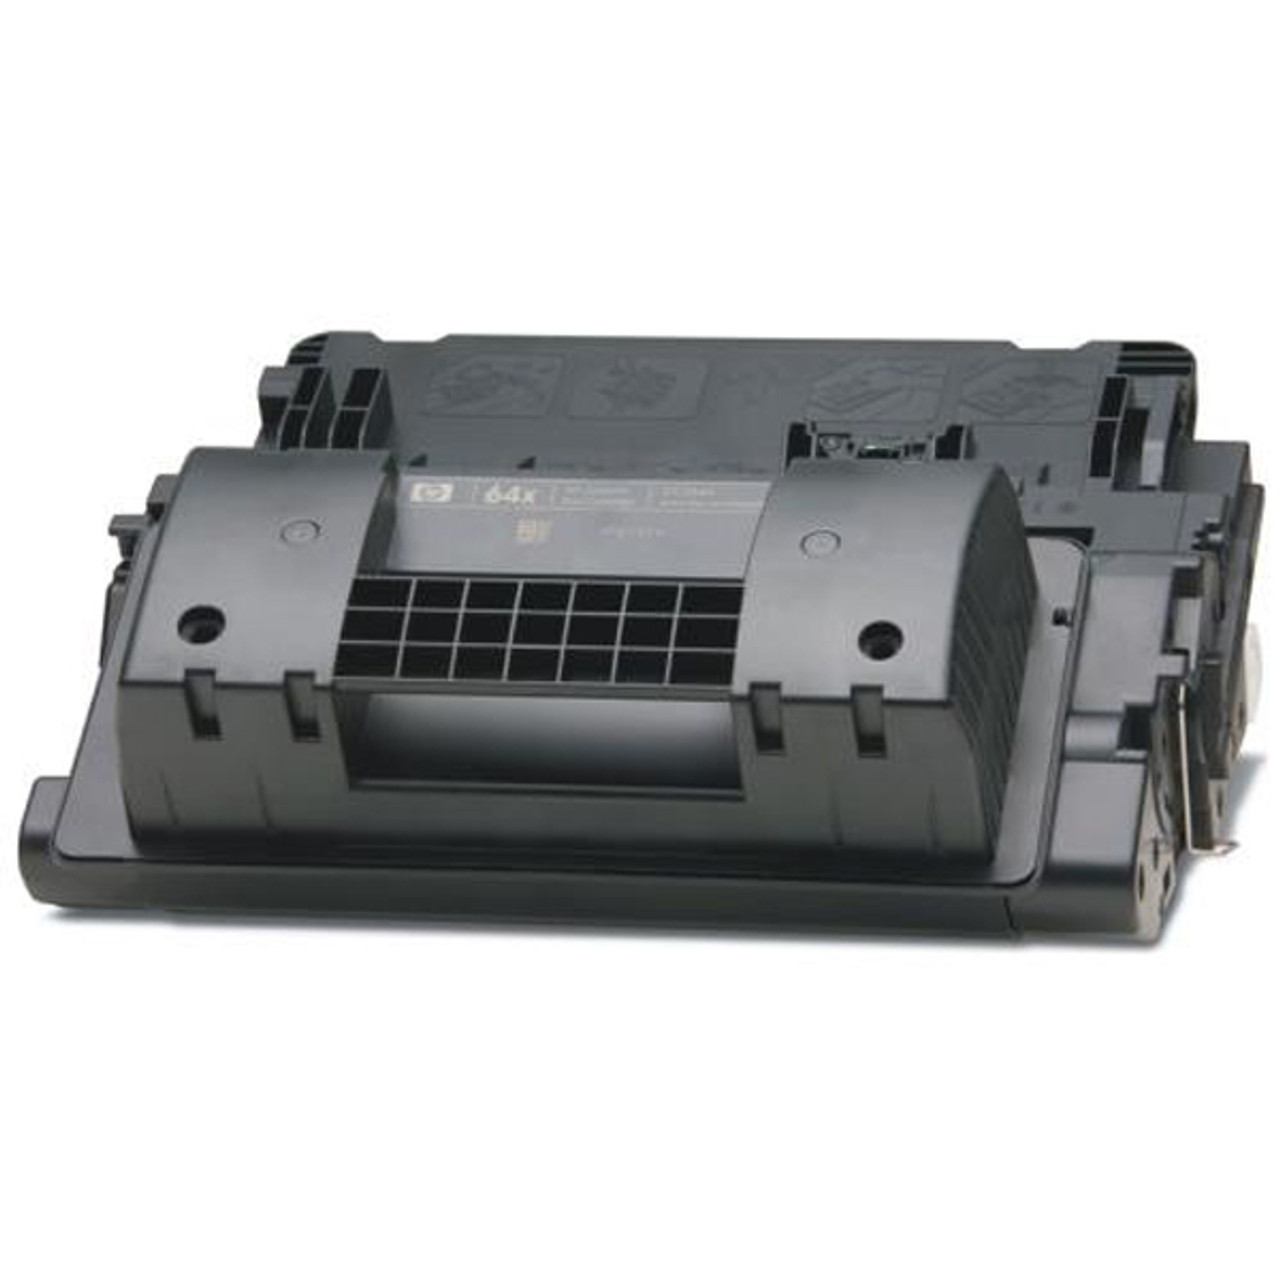 HP P4015 P515 High Yield MICR Toner Cartridge - New compatible